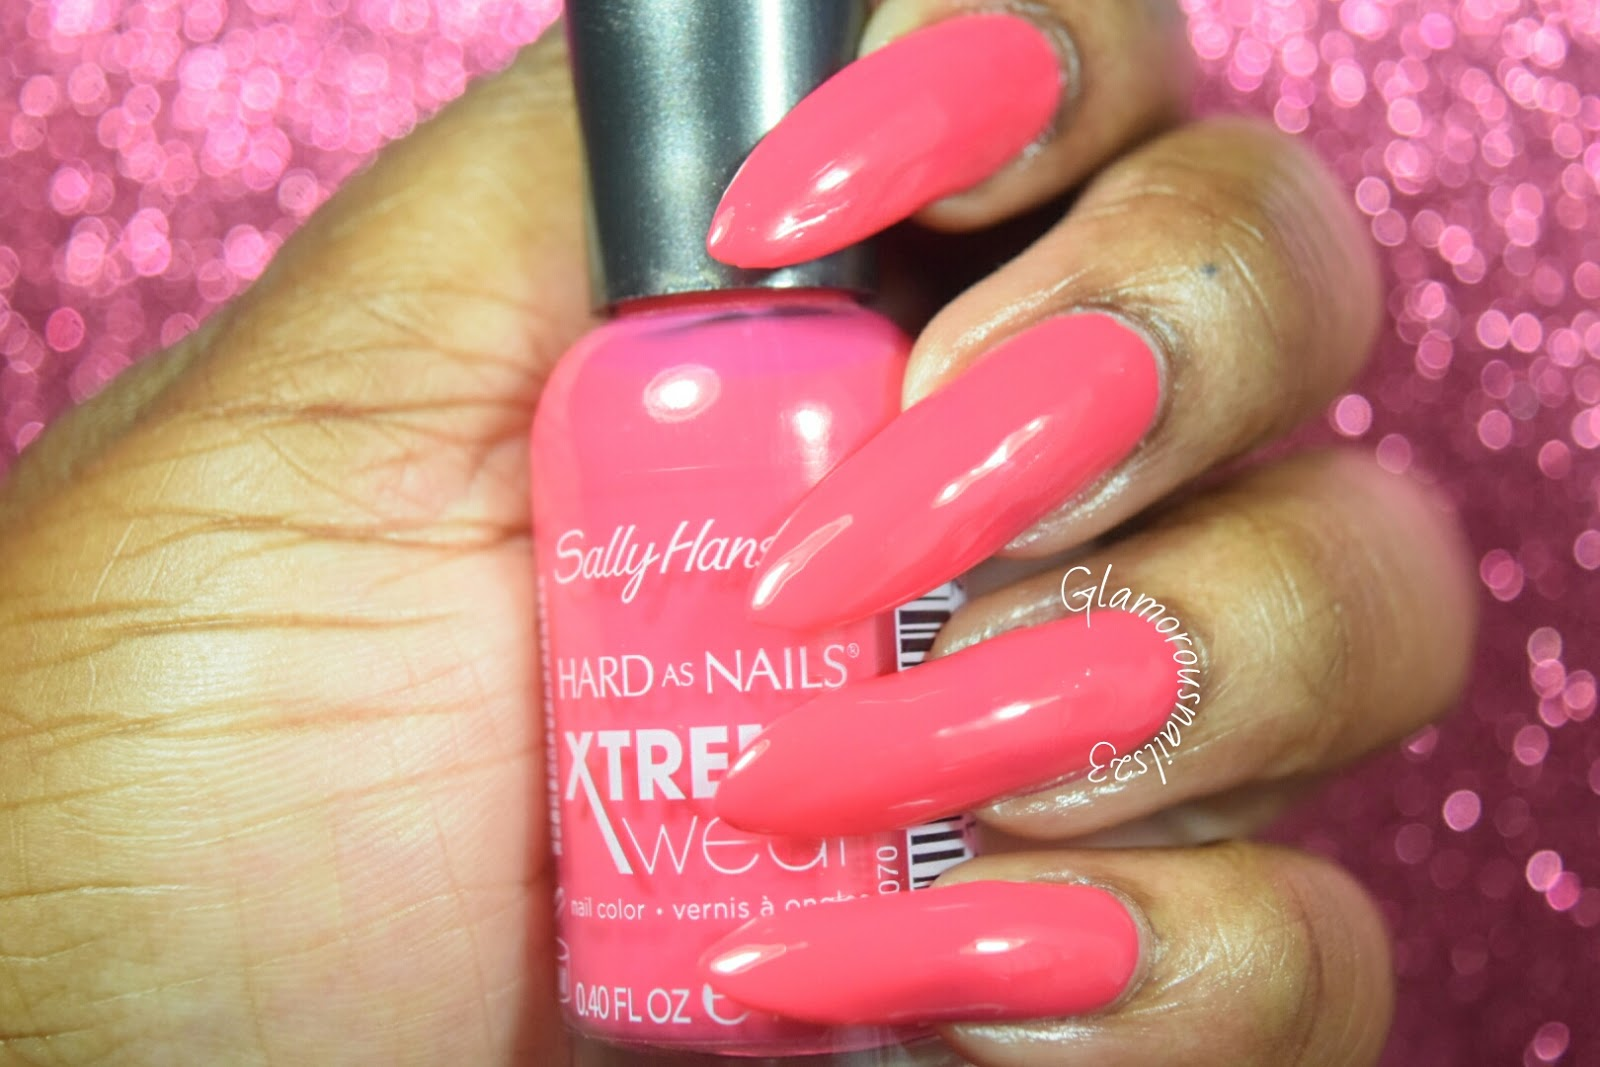 Sally Hansen Xtreme Wear Pink Punk Swatches & Review - Glamorousnails23